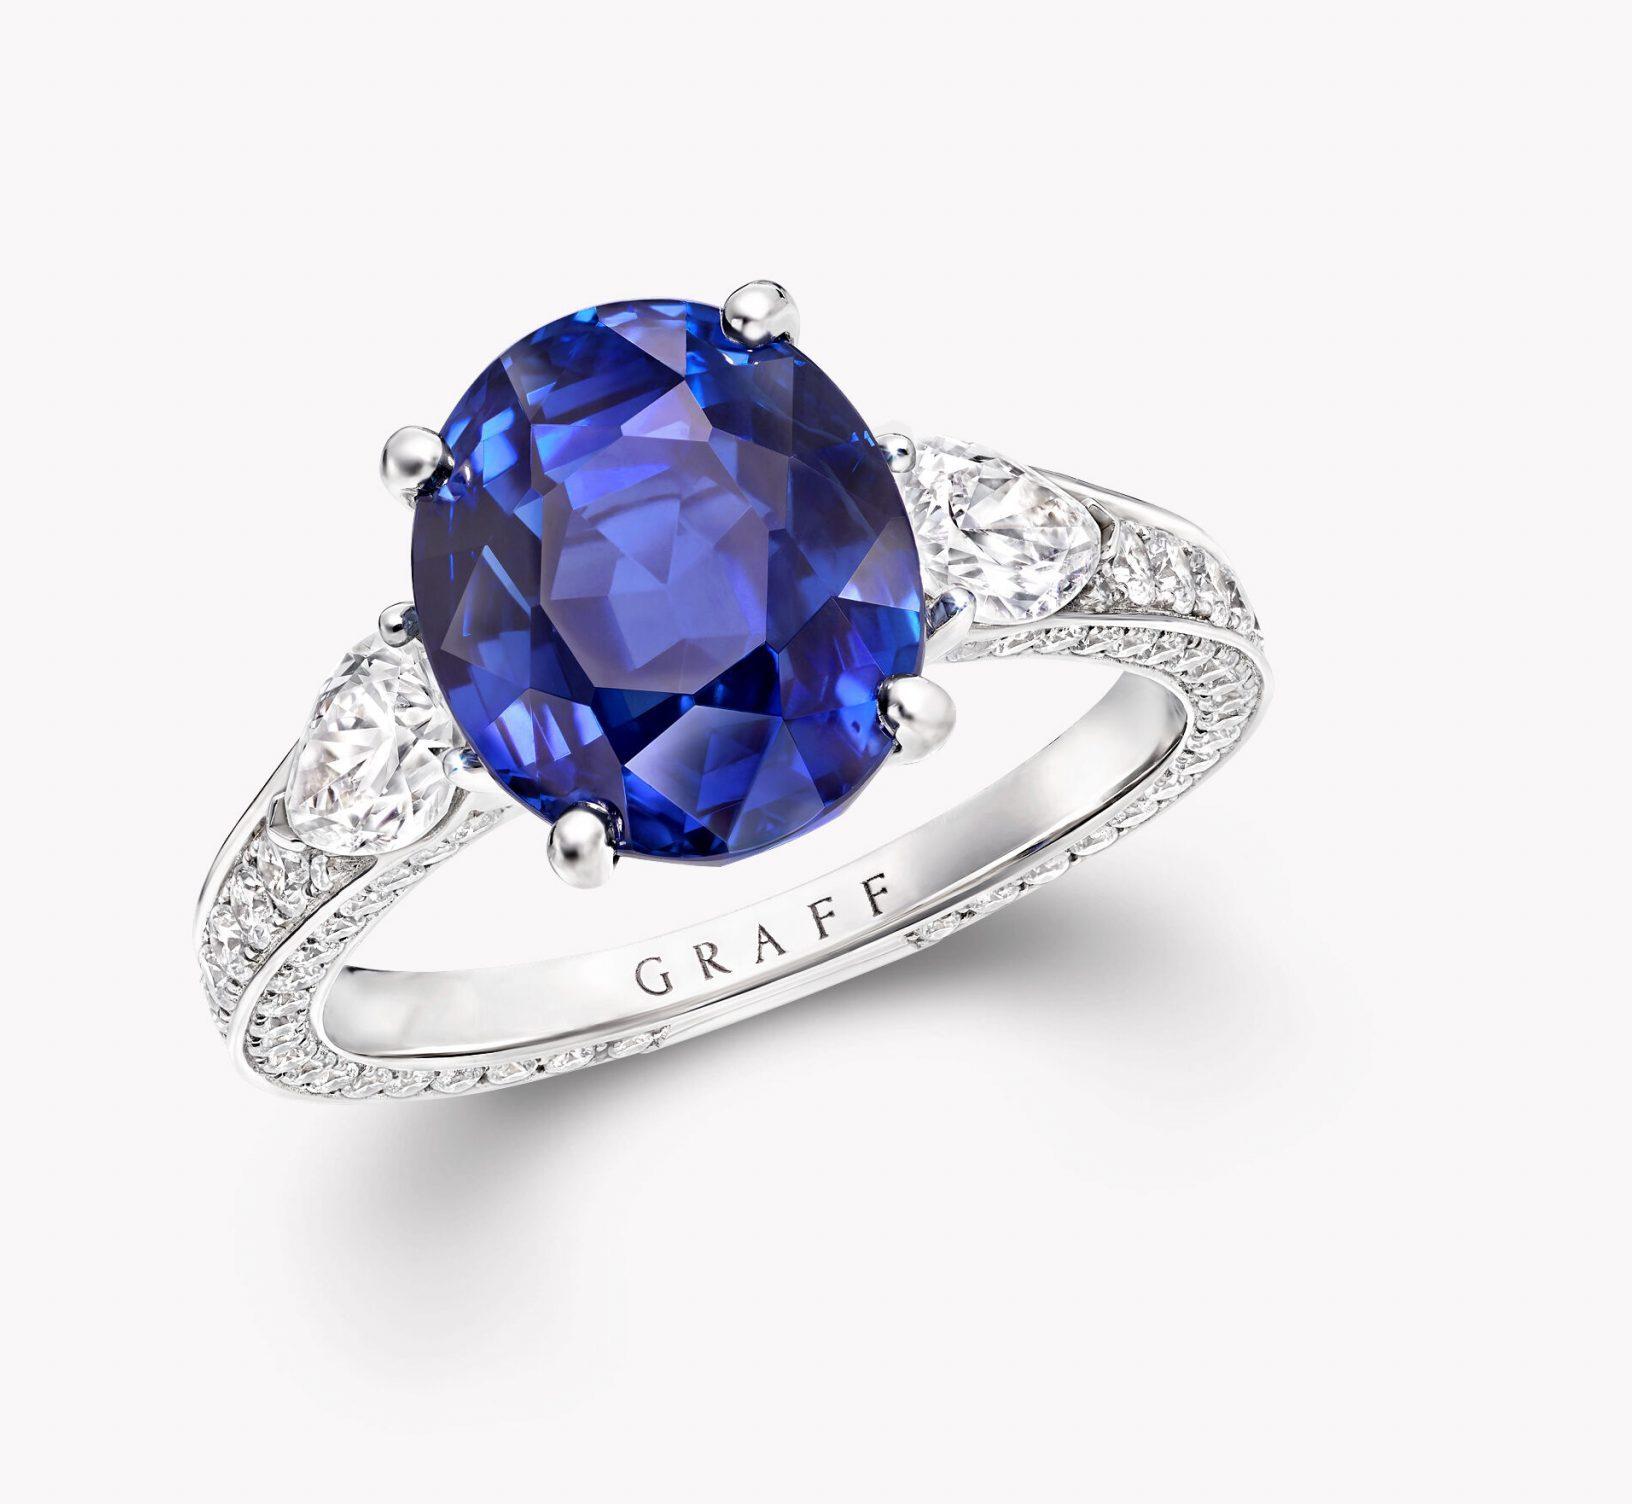 Oval Sapphire Jewellery Ring, Graff